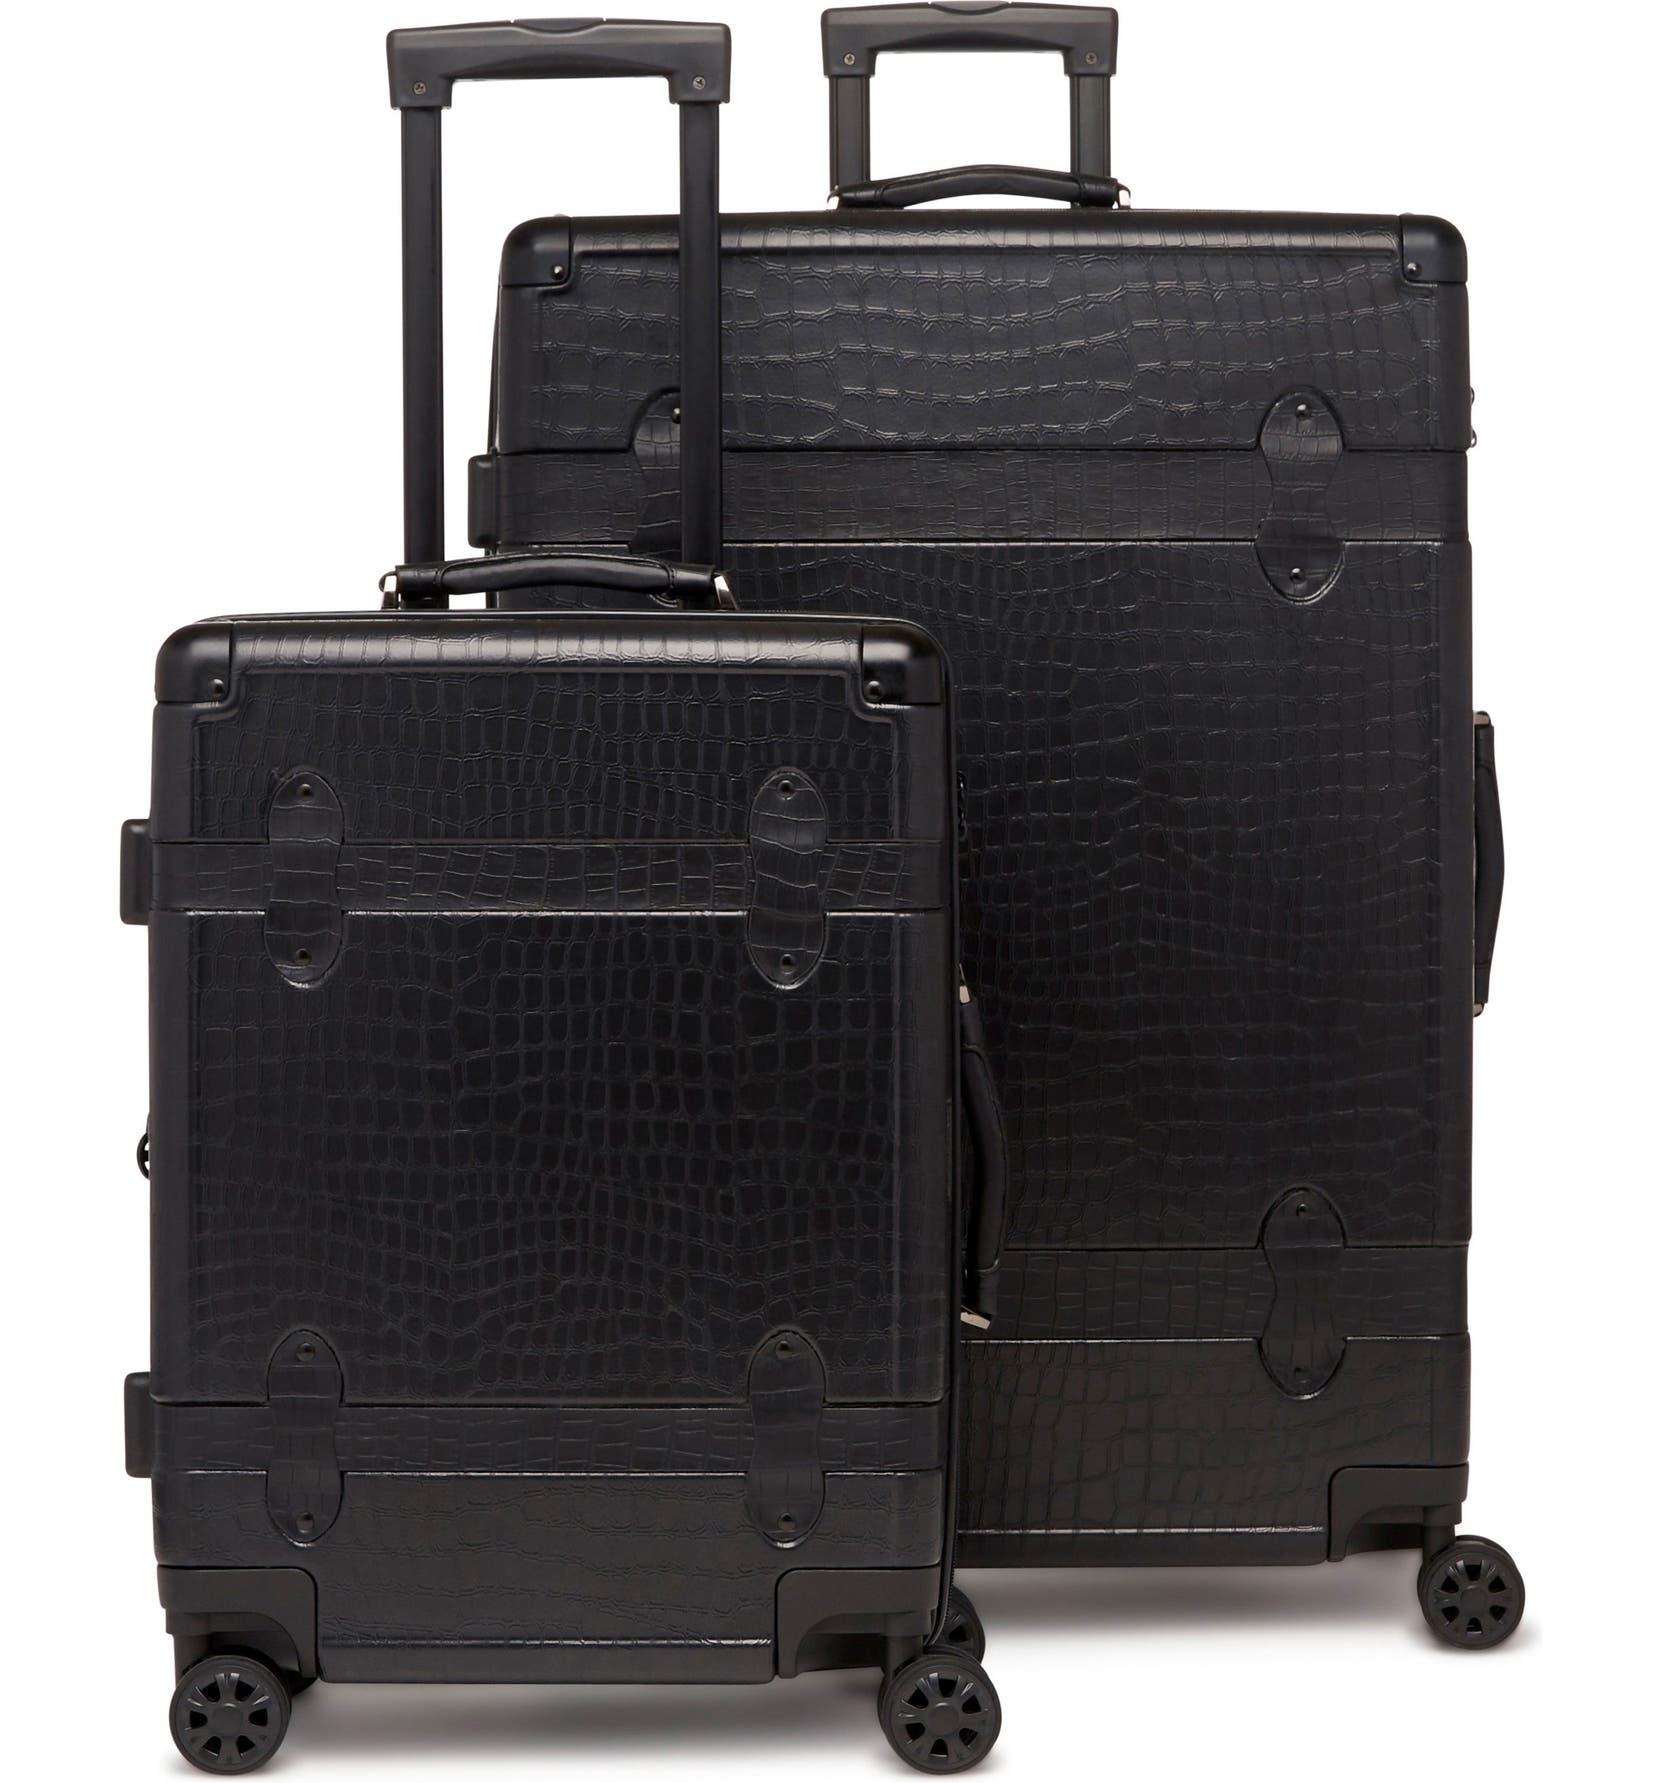 c461f0f9375d CALPAK 20-Inch & 28-Inch Trunk Rolling Luggage Set | Nordstrom